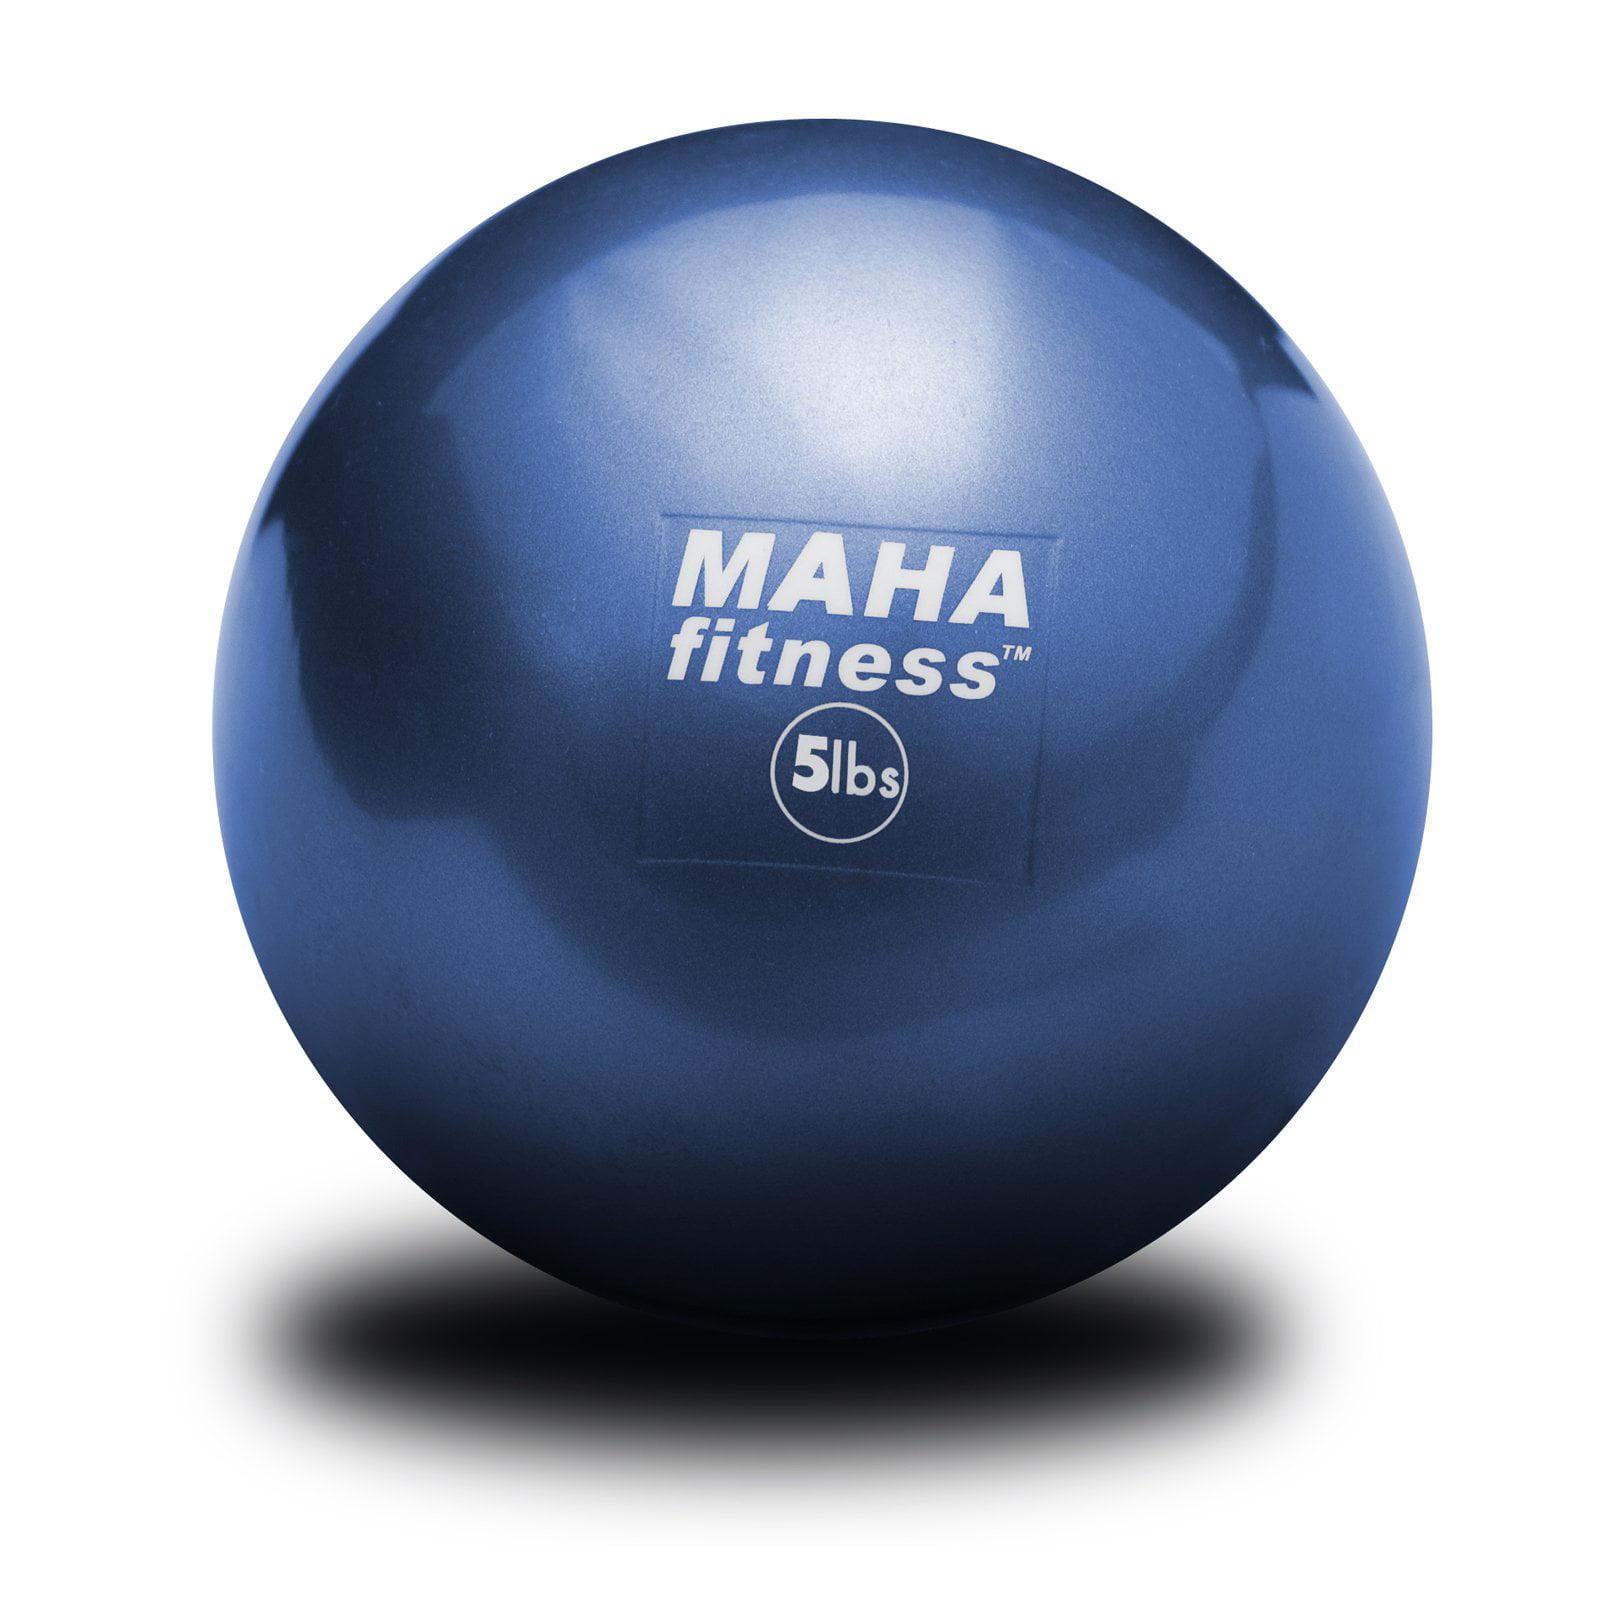 Maha Fitness Weighted Toning Ball